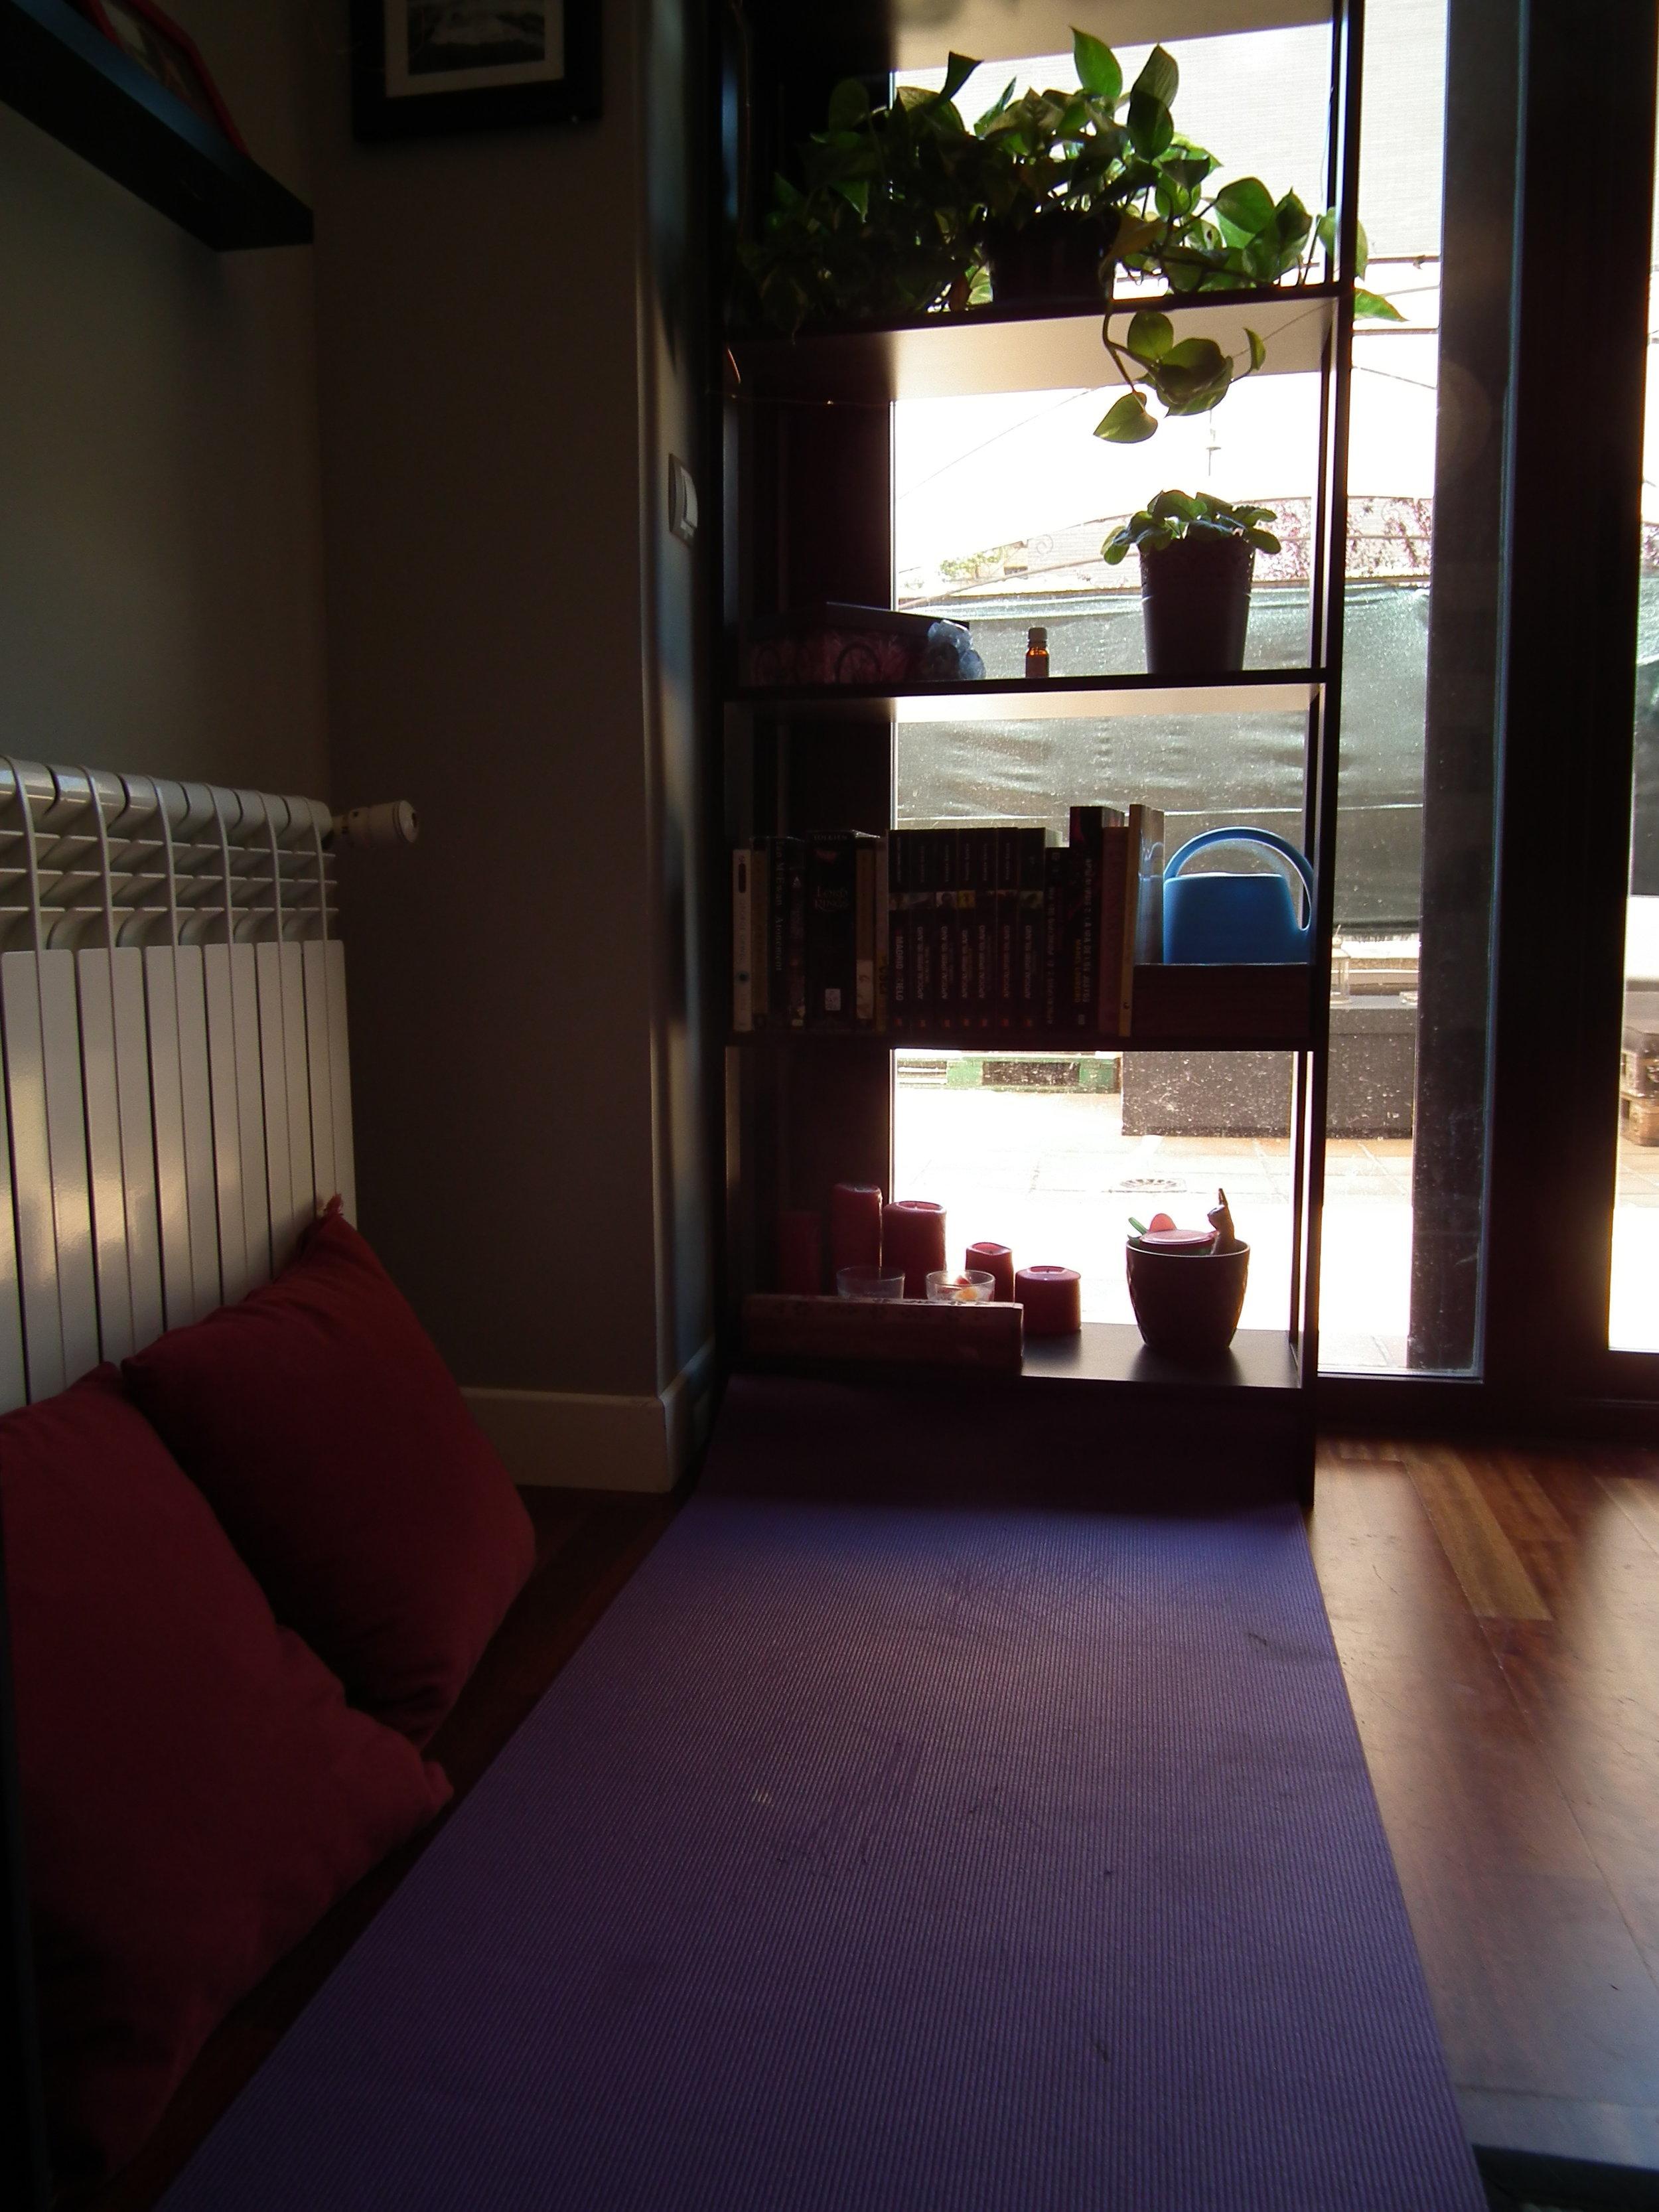 mindfulness-meditation-zen-corner-yoga-mat